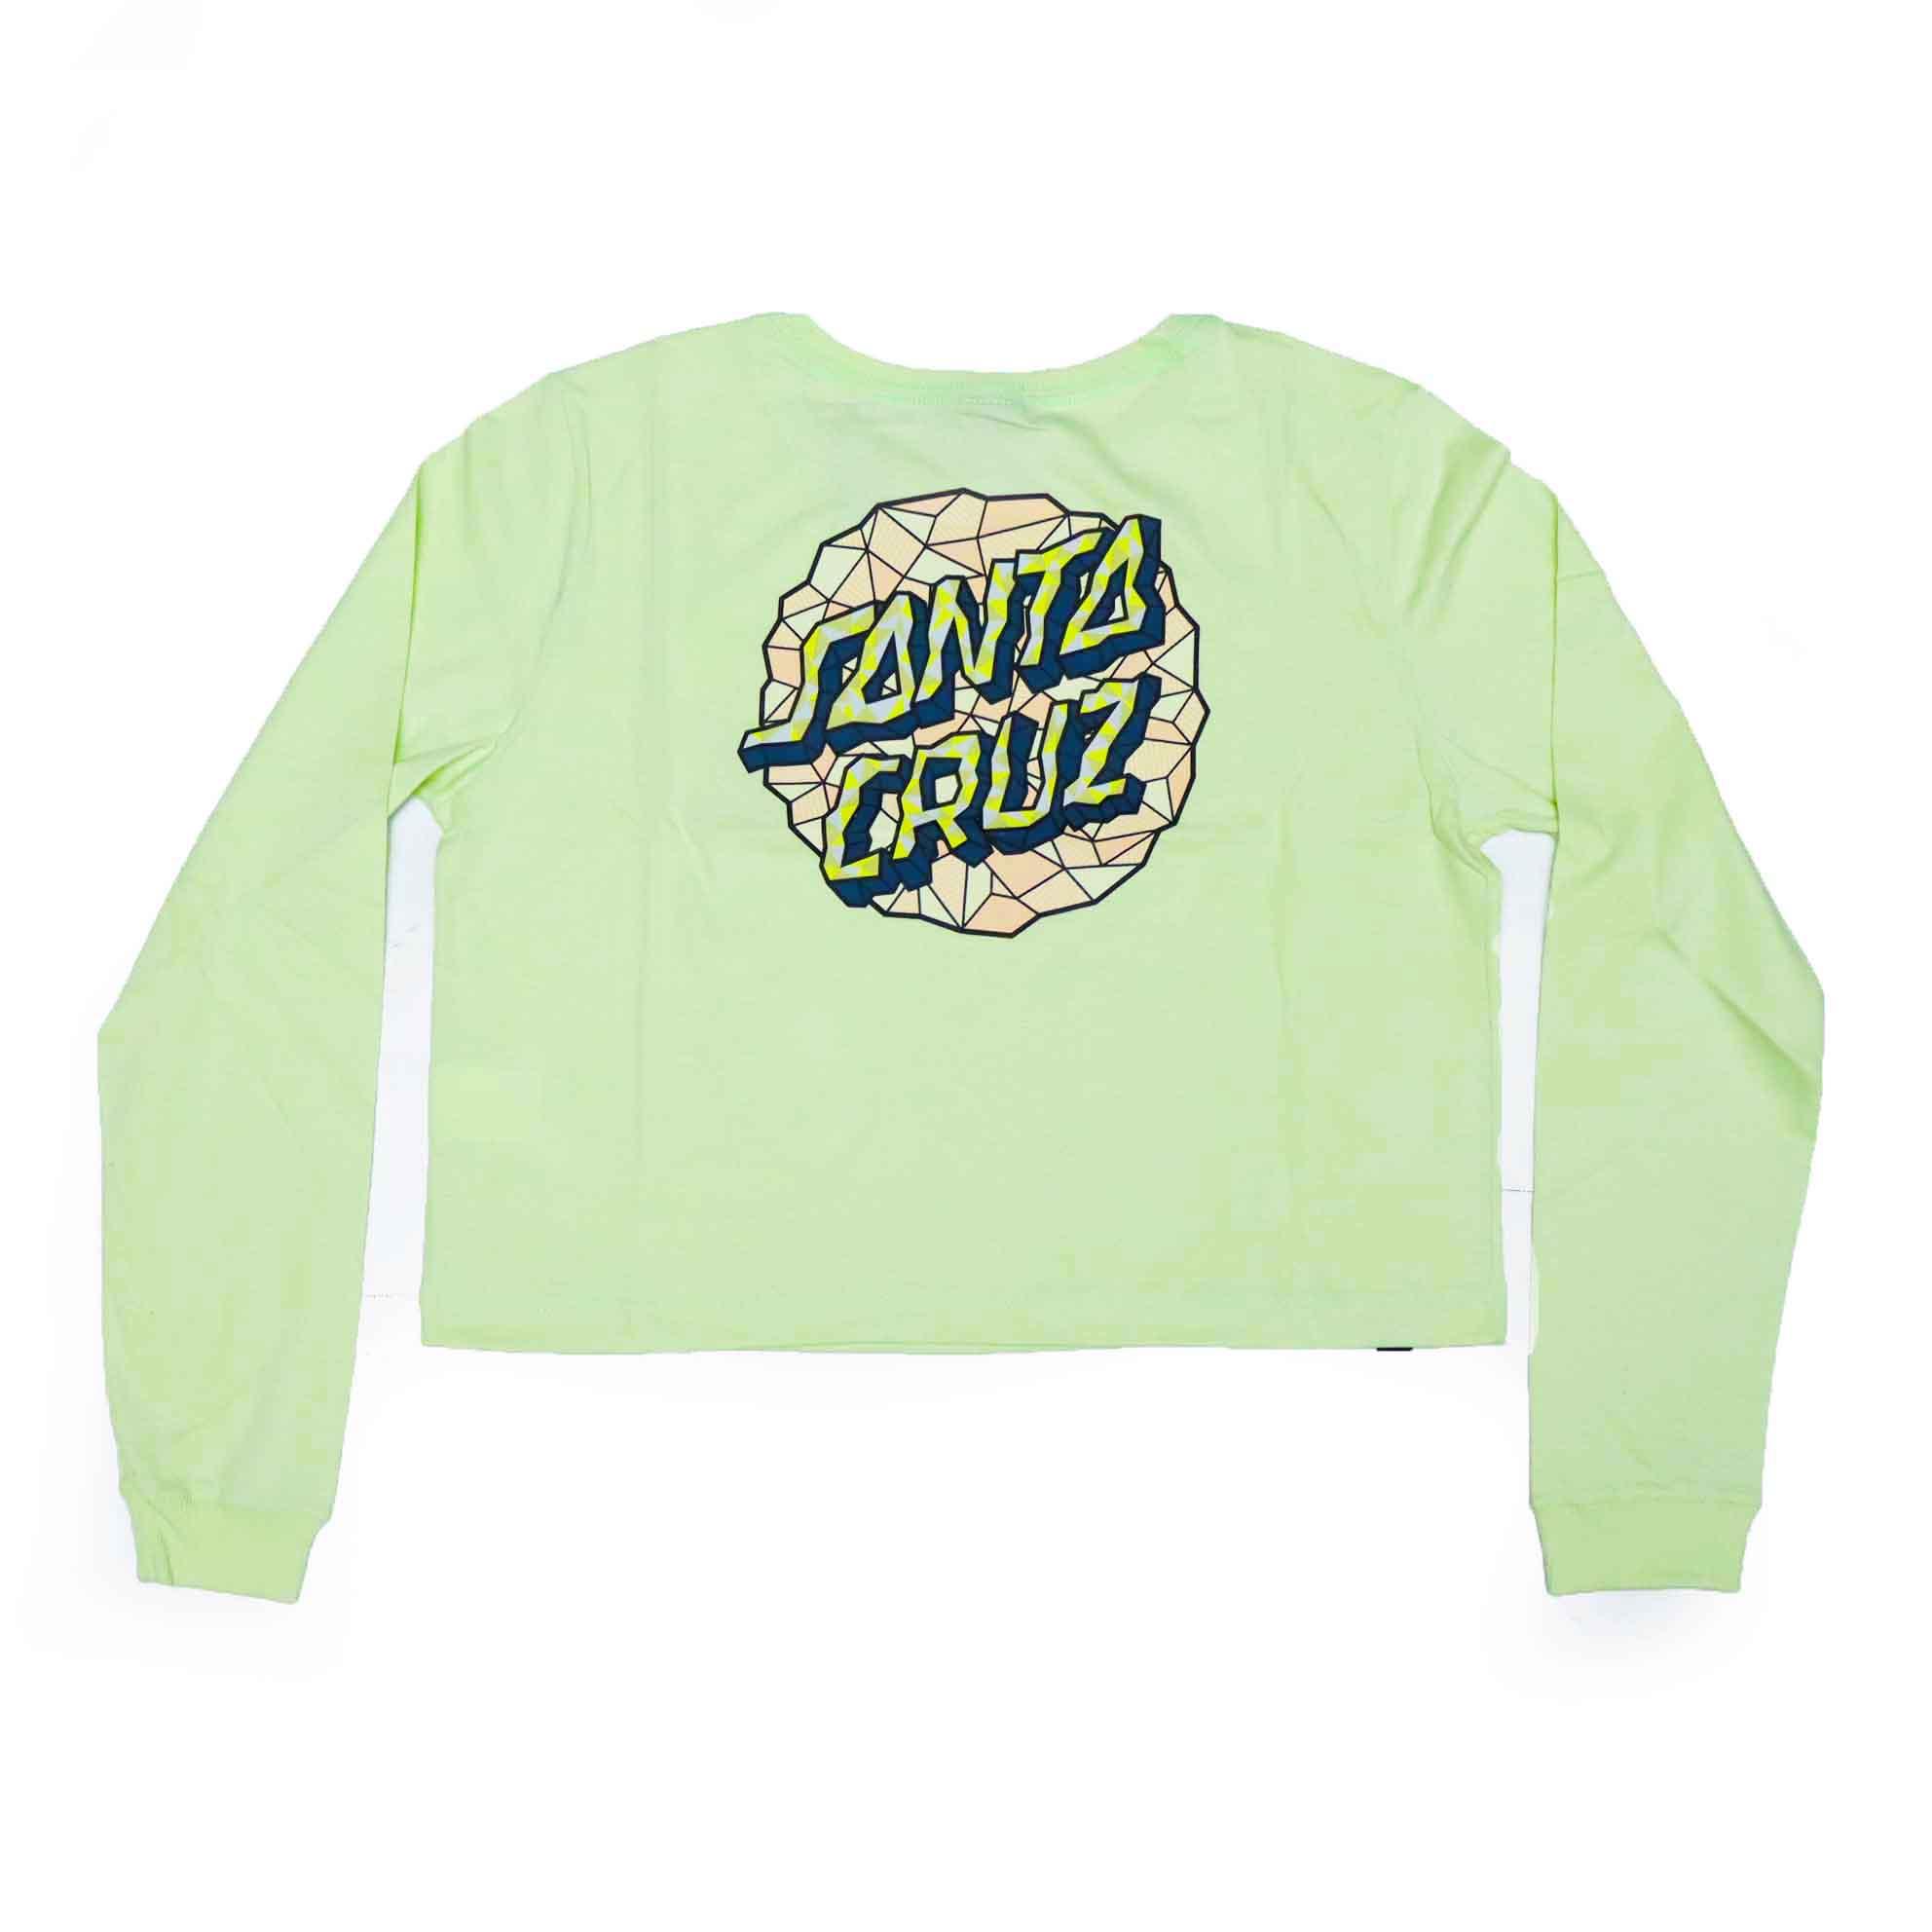 Camiseta Manga Longa Feminina Santa Cruz Cropped Facet Dot - Verde Claro